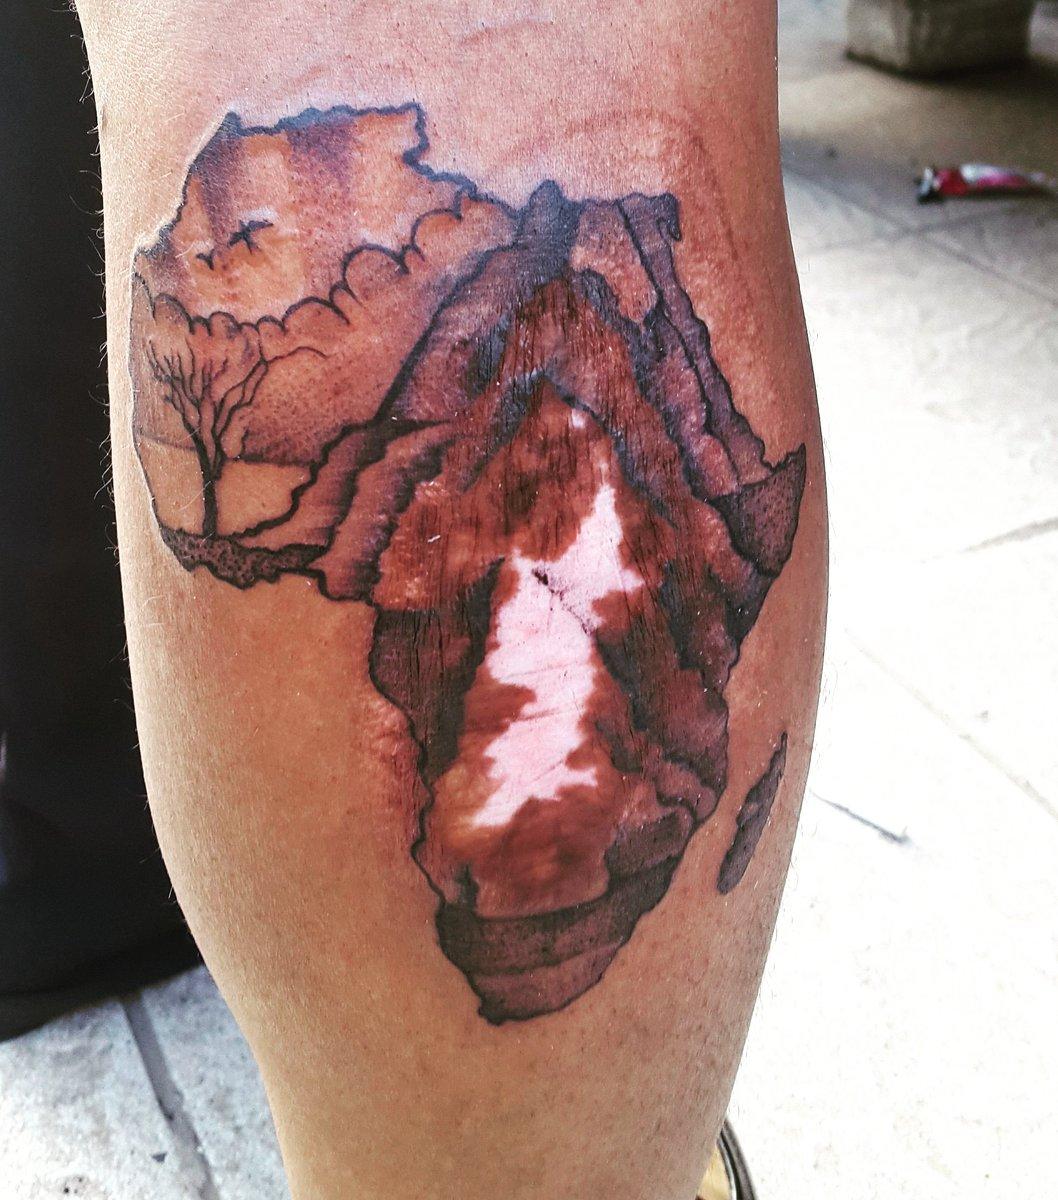 cfa2b8a89 Soweto Ink Tattoo Lifestyle 🇿🇦 on Twitter: